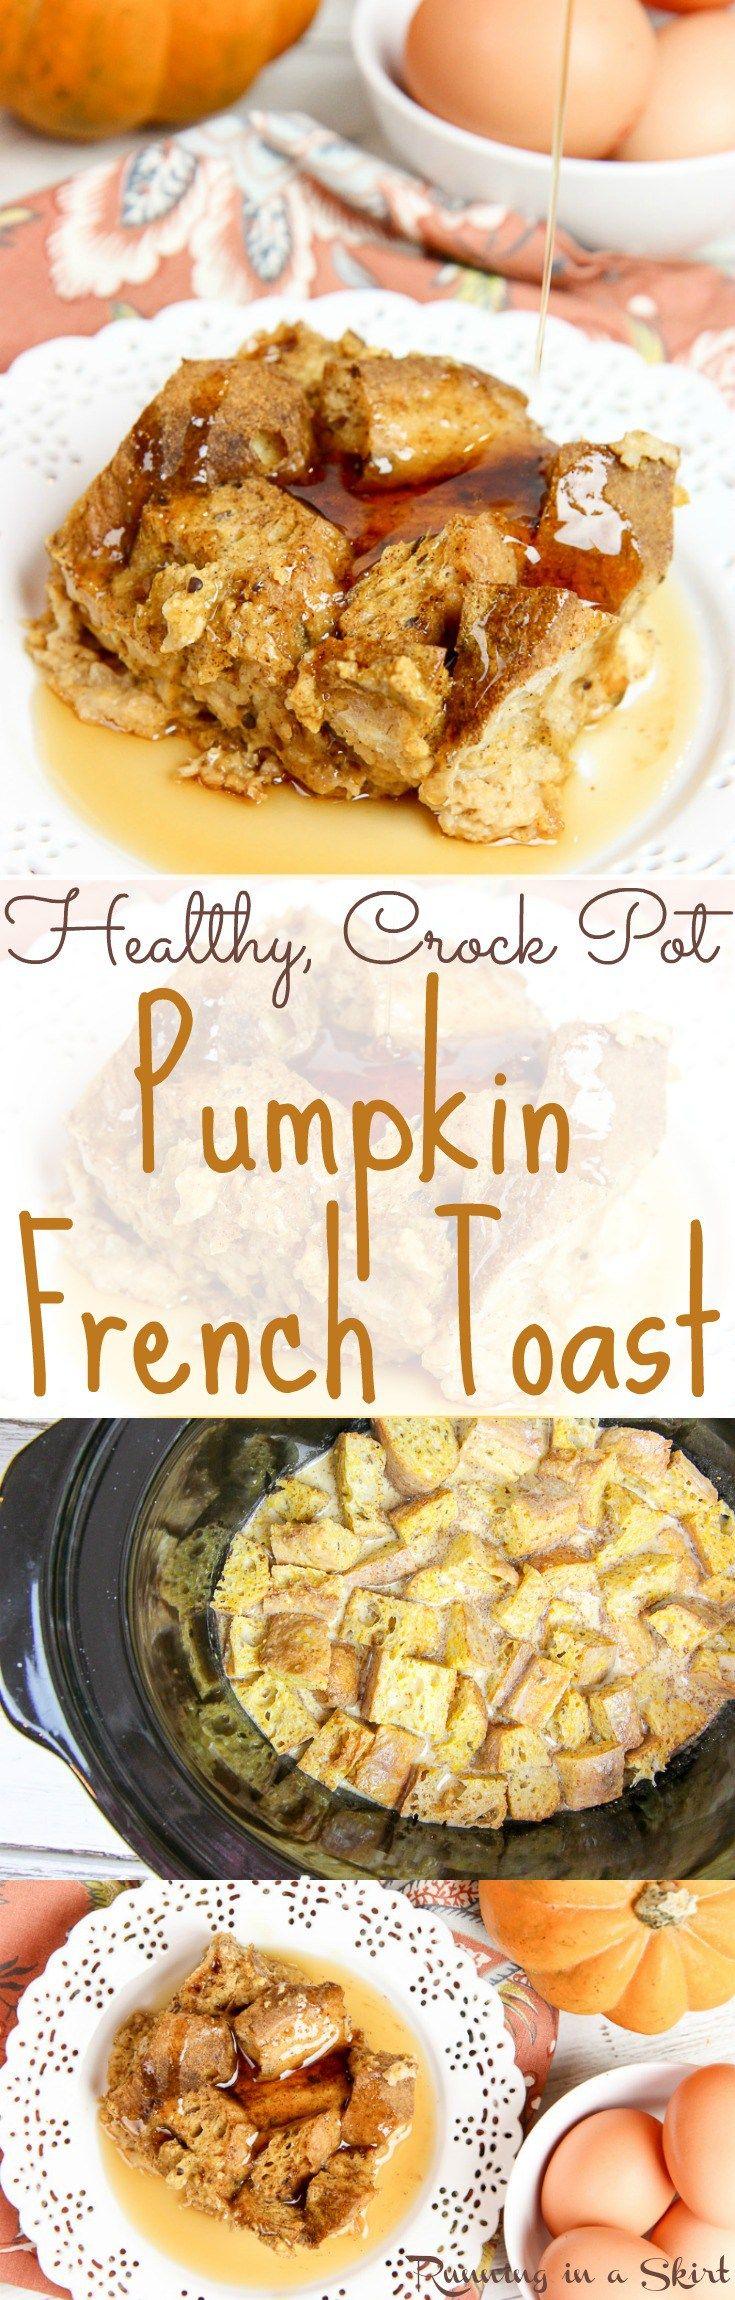 Healthy Crock Pot Pumpkin French Toast recipe/ Running in a Skirt